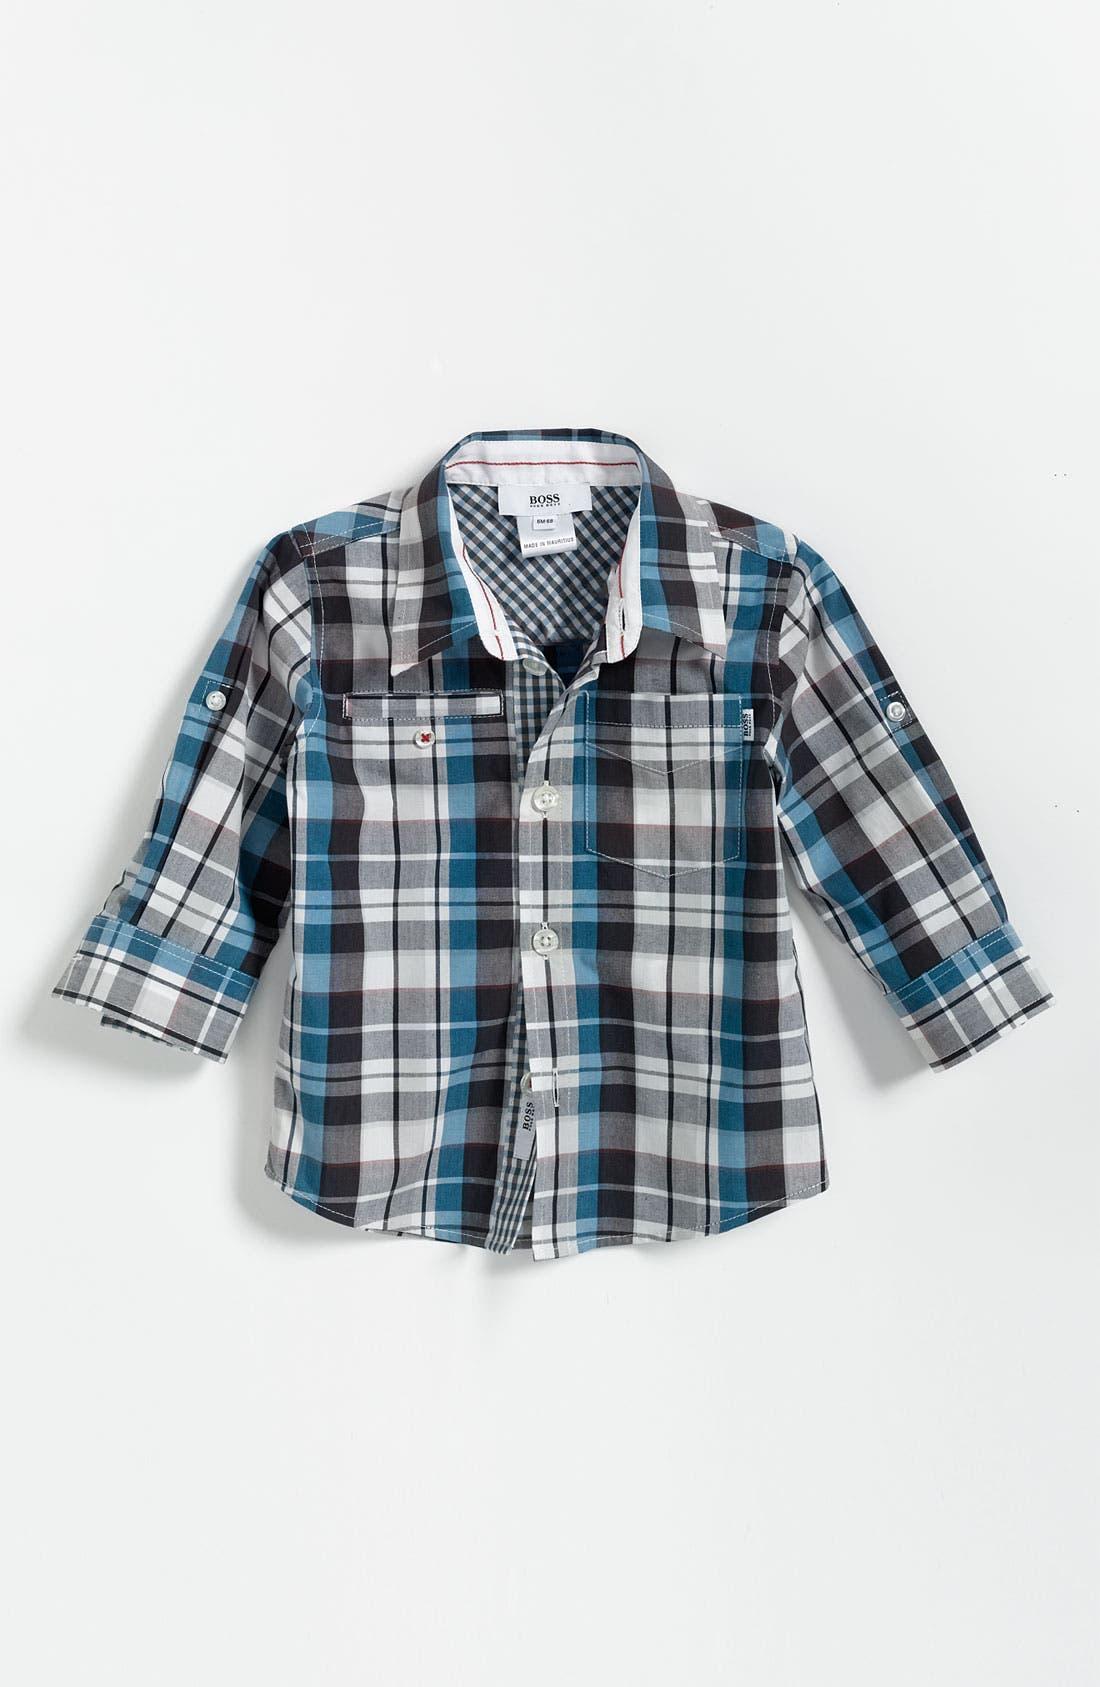 Main Image - BOSS Kidswear Check Print Shirt (Toddler)